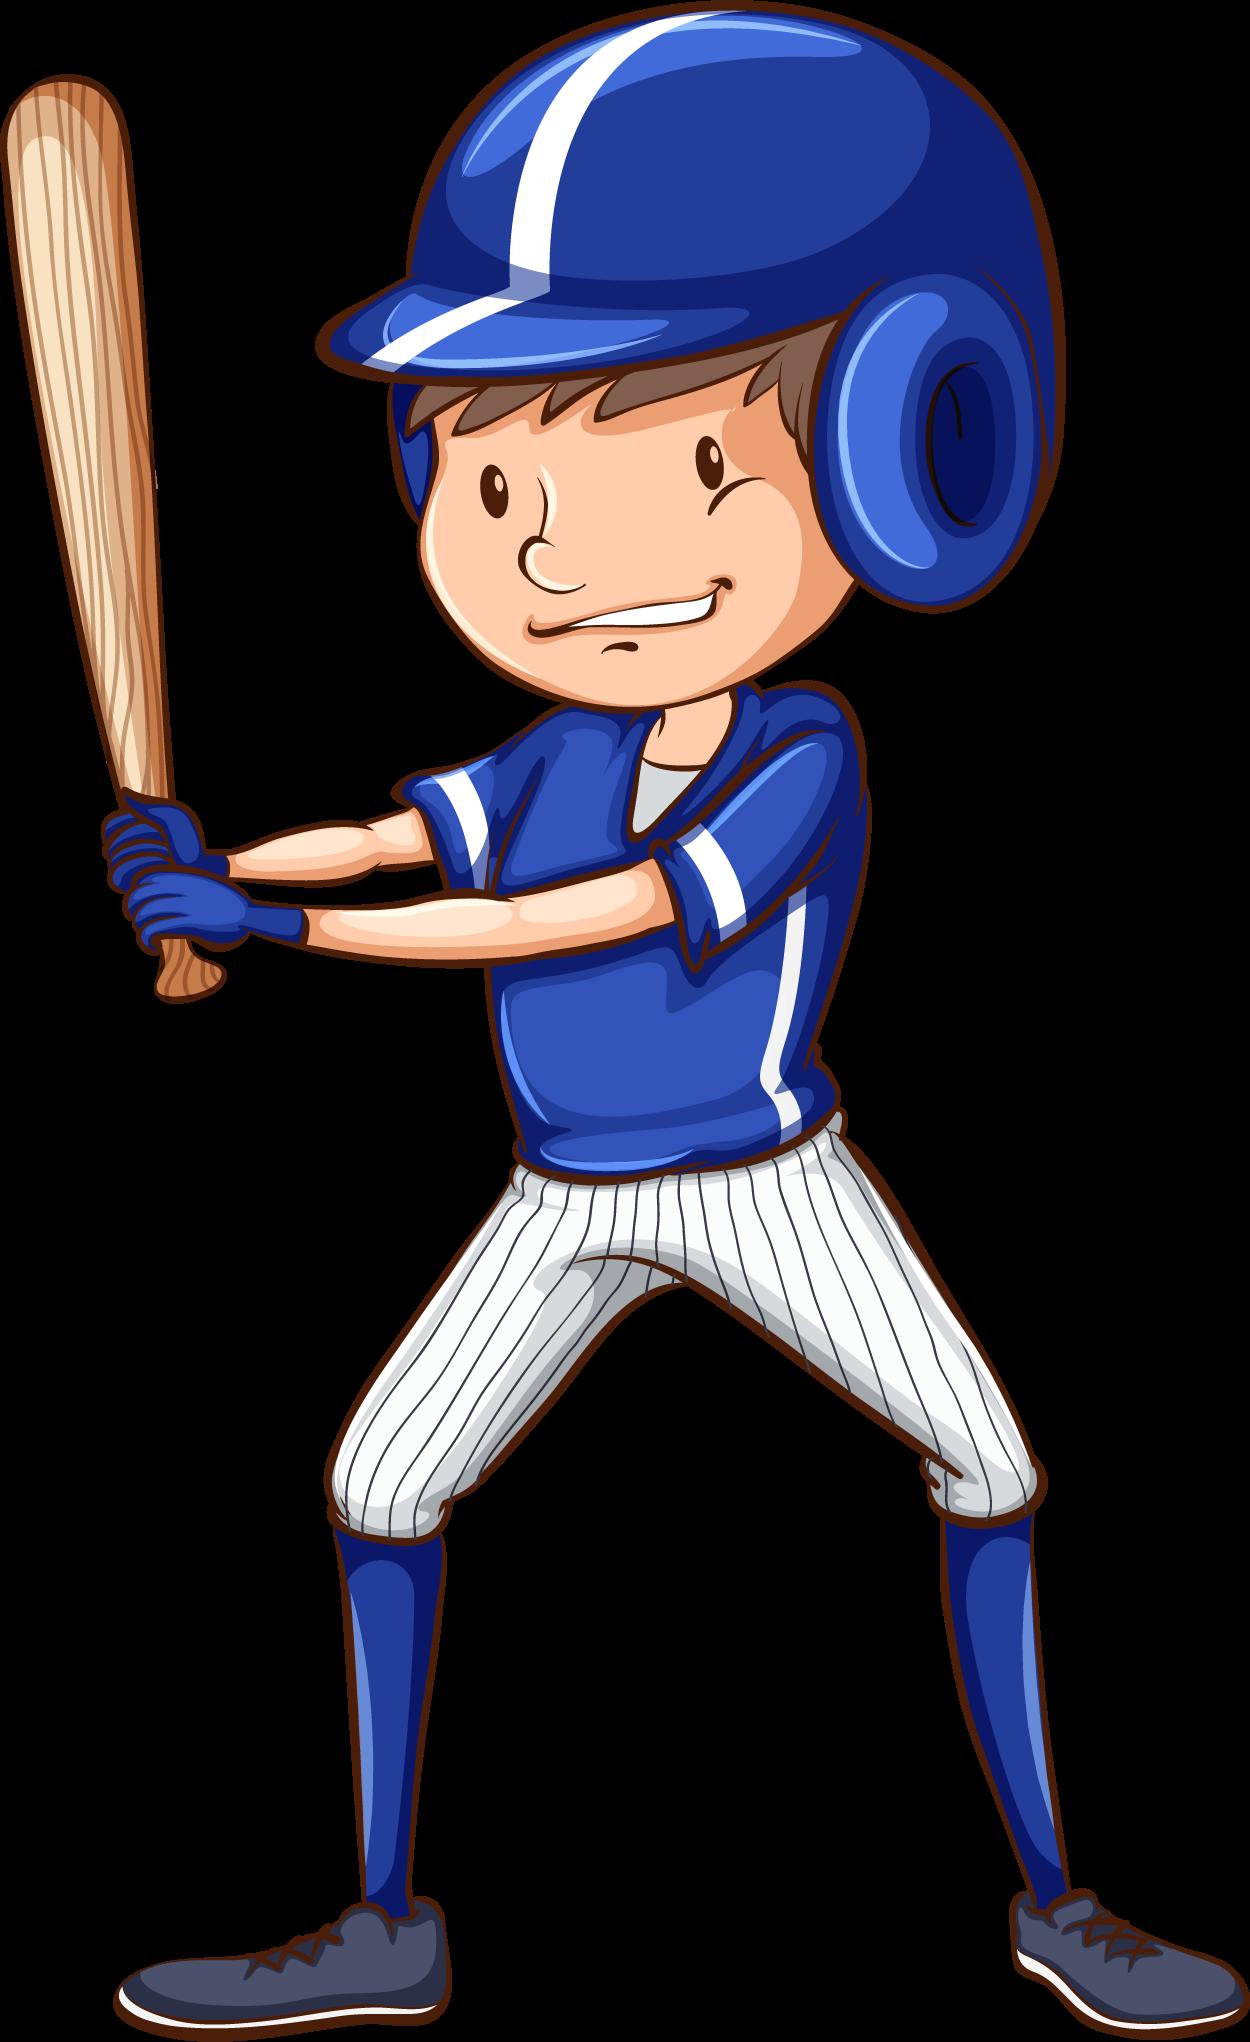 Béisbol equipo azul